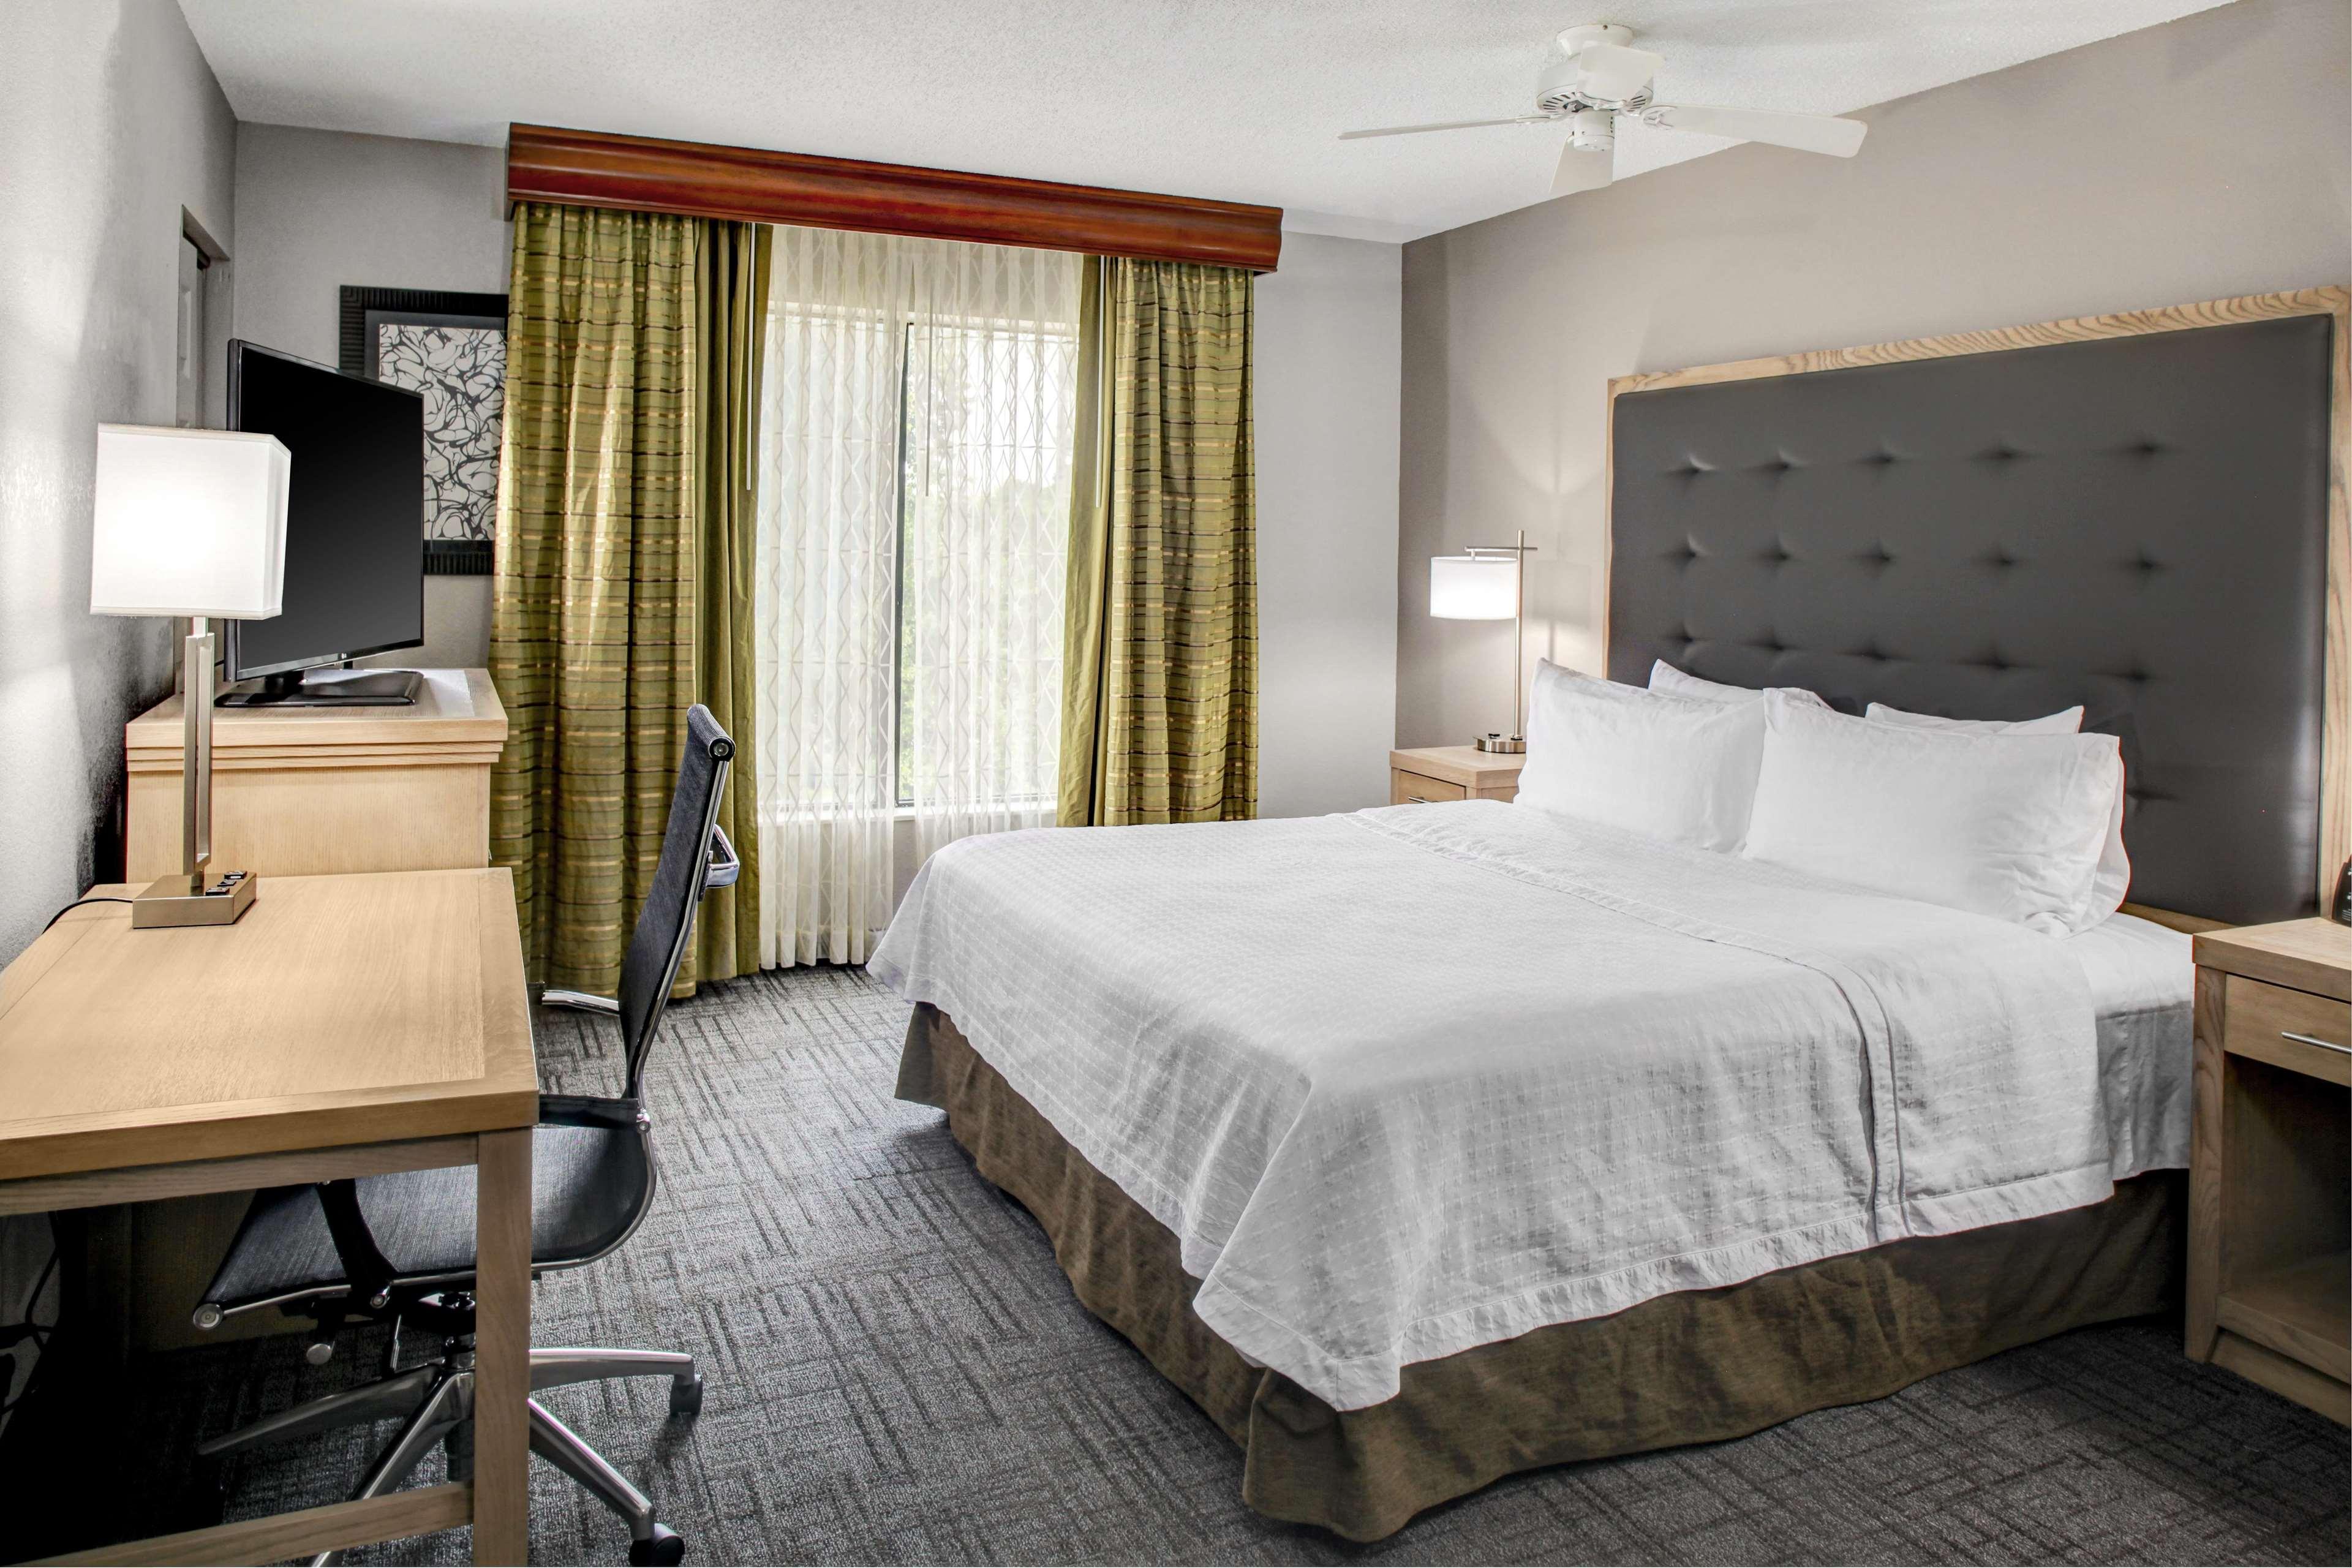 Homewood Suites by Hilton Richmond-West End/Innsbrook image 15